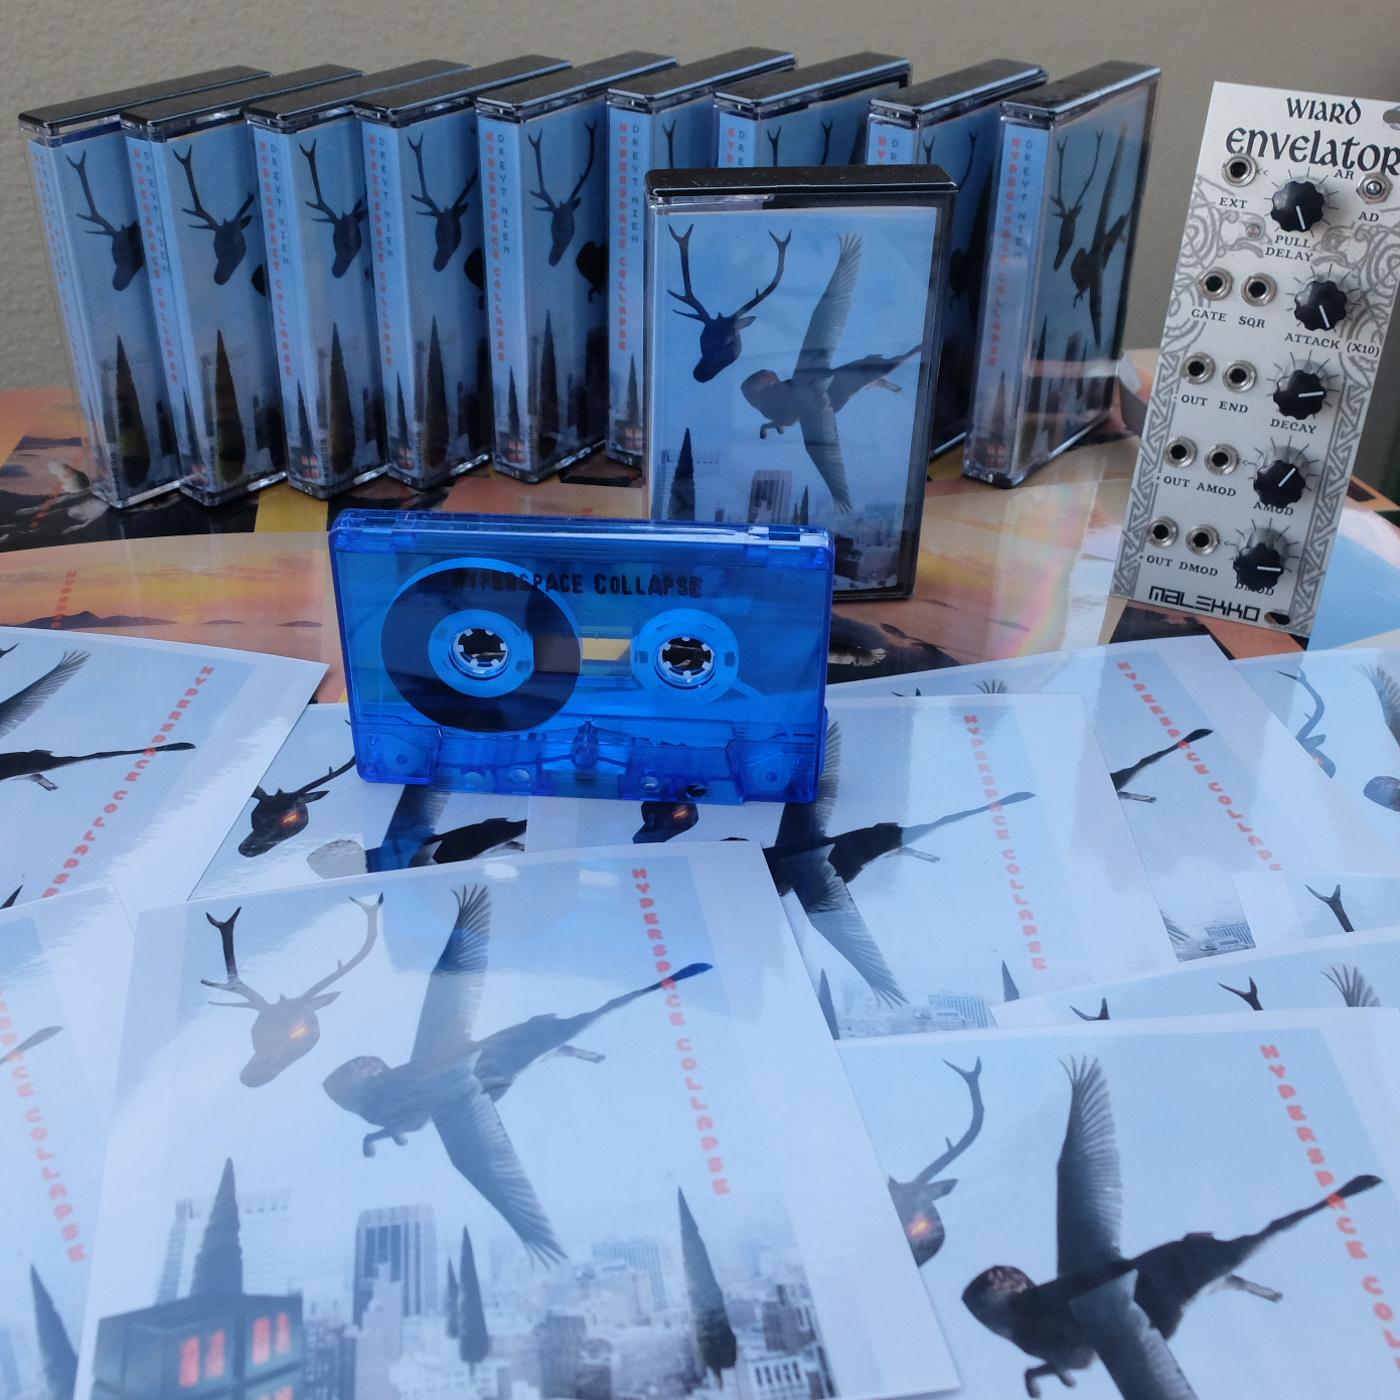 cassette dreyt nien